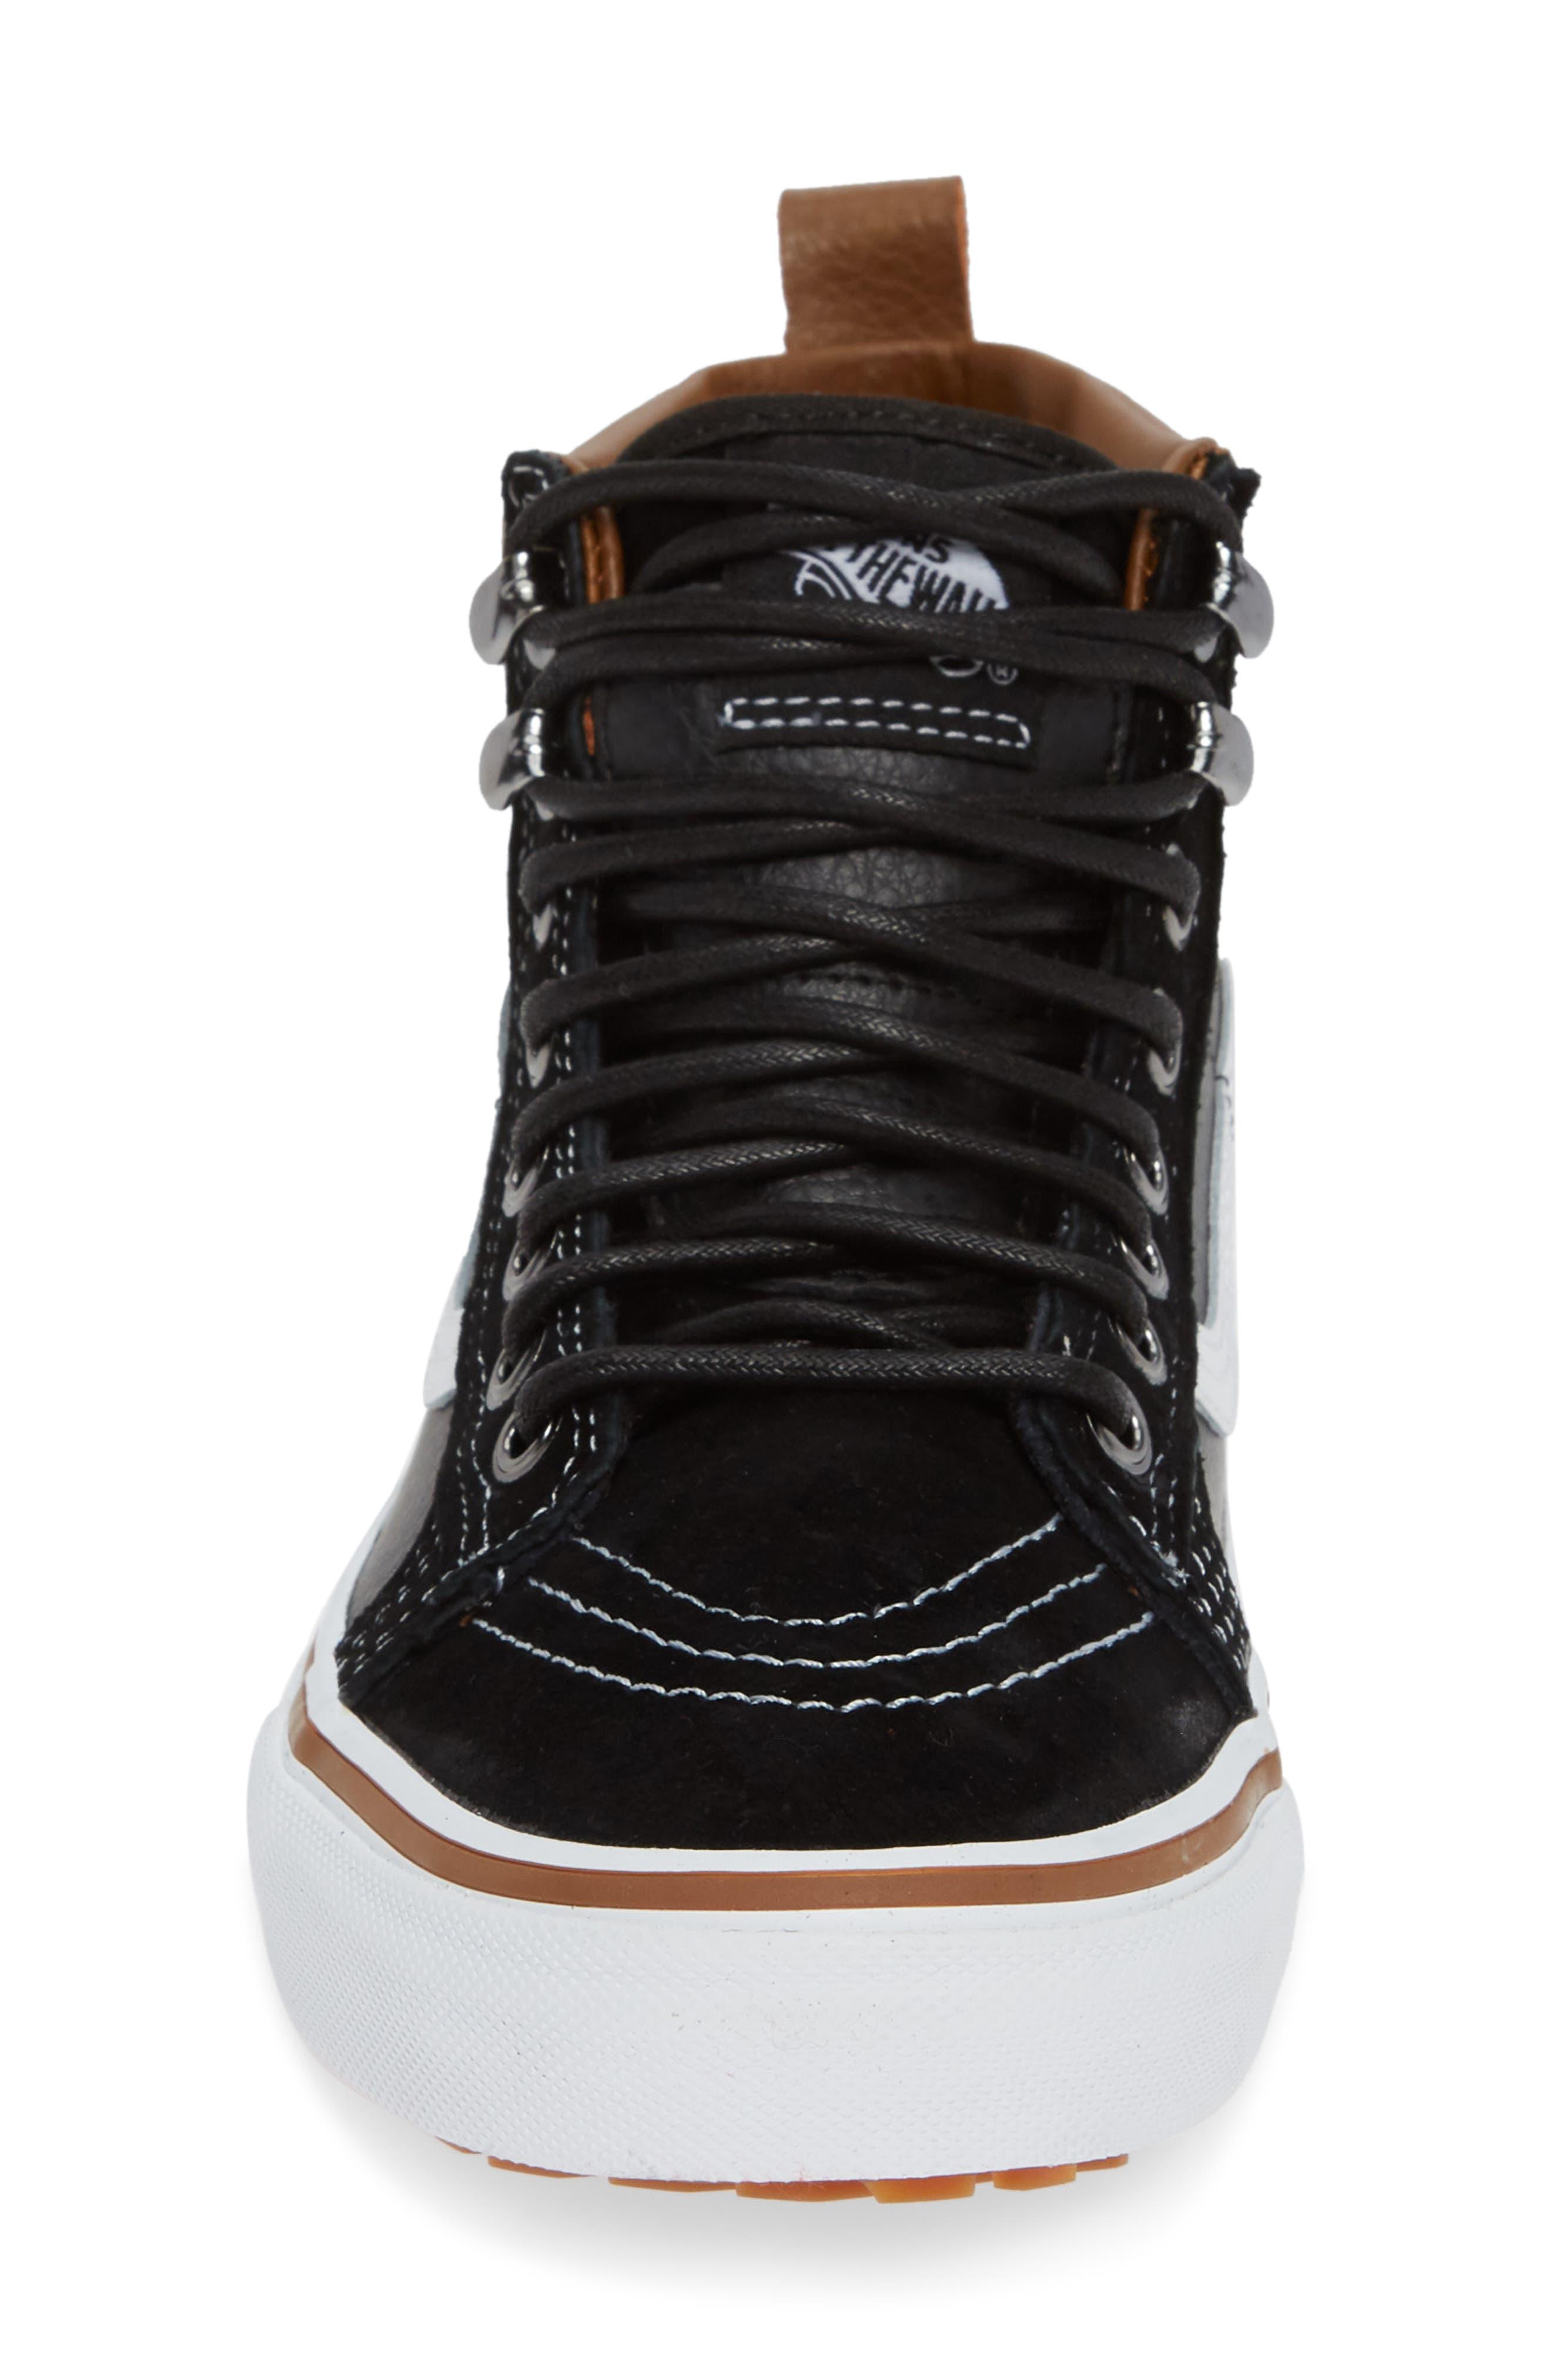 Sk-8 Hi MTE Sneaker,                             Alternate thumbnail 4, color,                             LEATHER/ BLACK/ TRUE WHITE